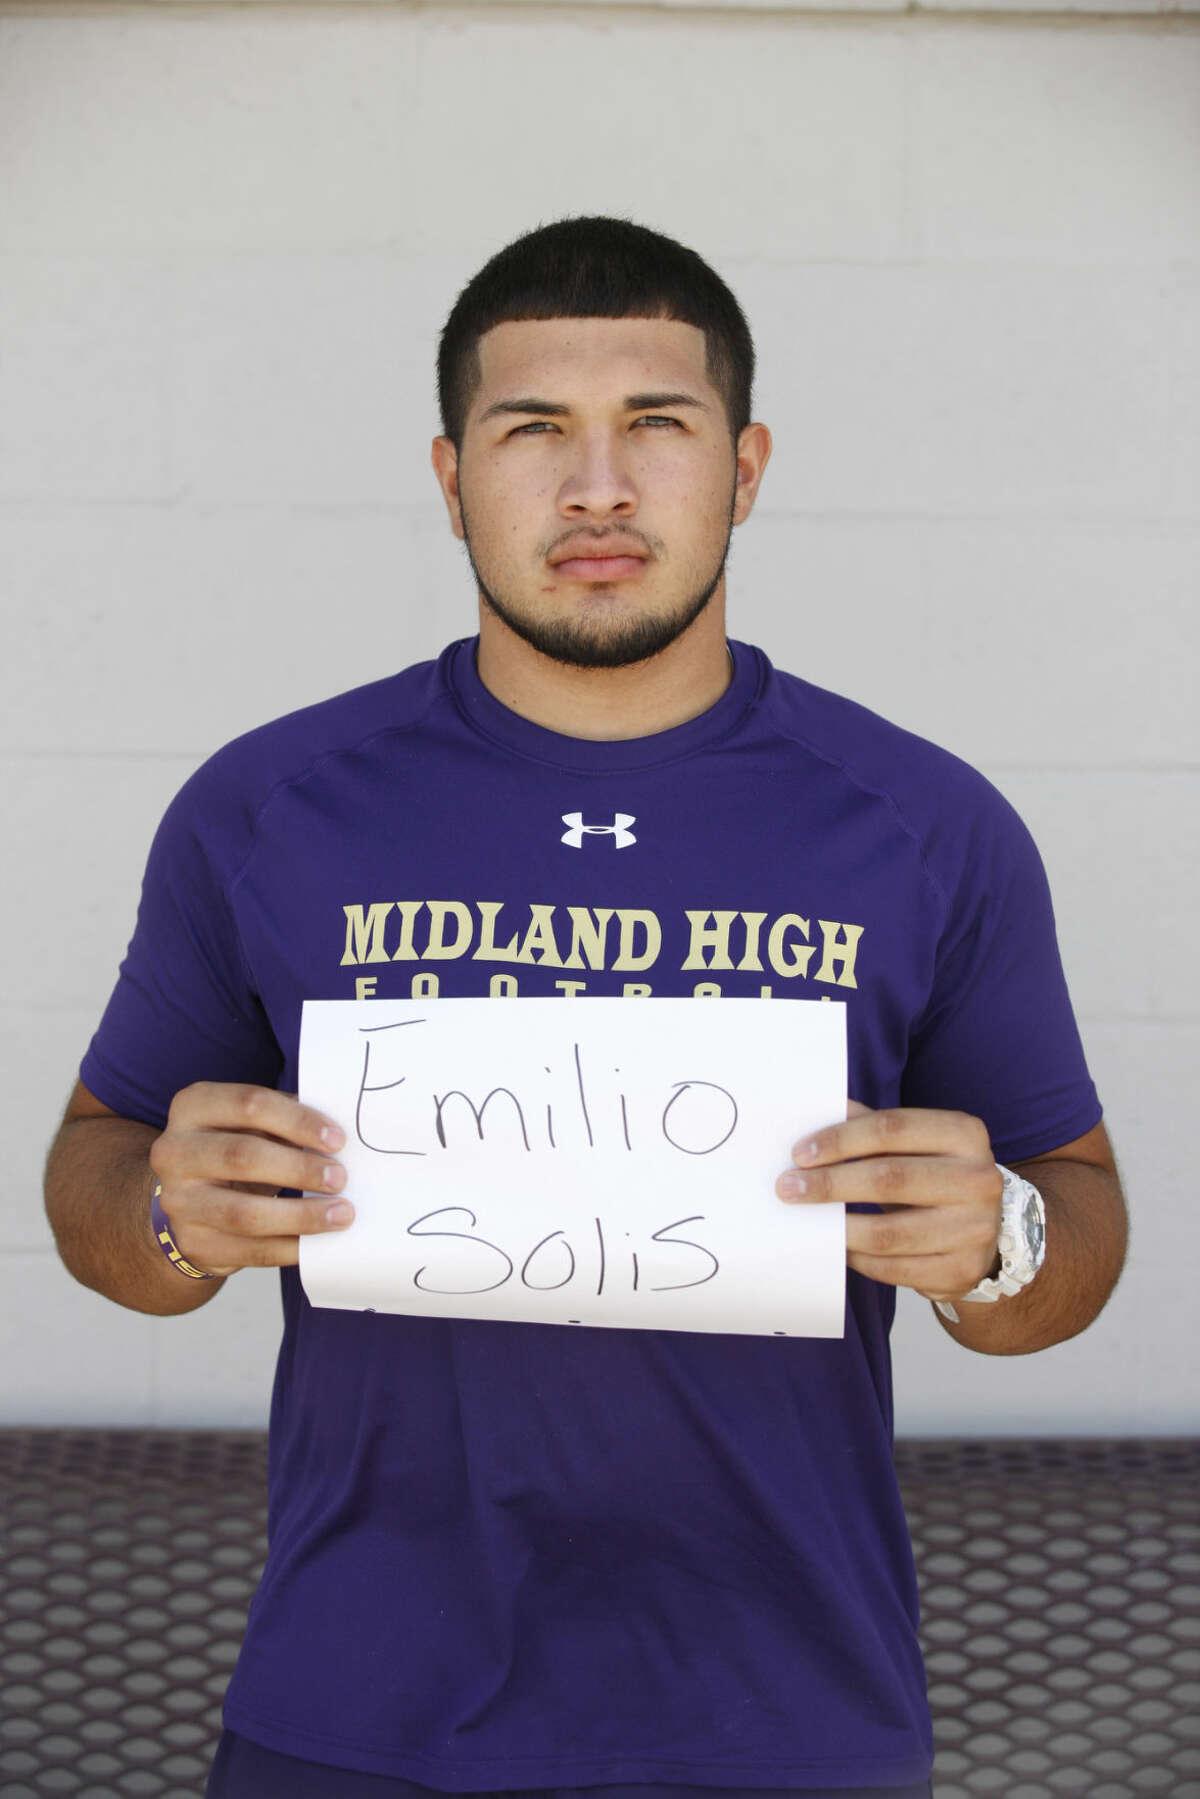 Midland High Varsity Football mug Emilio Solis